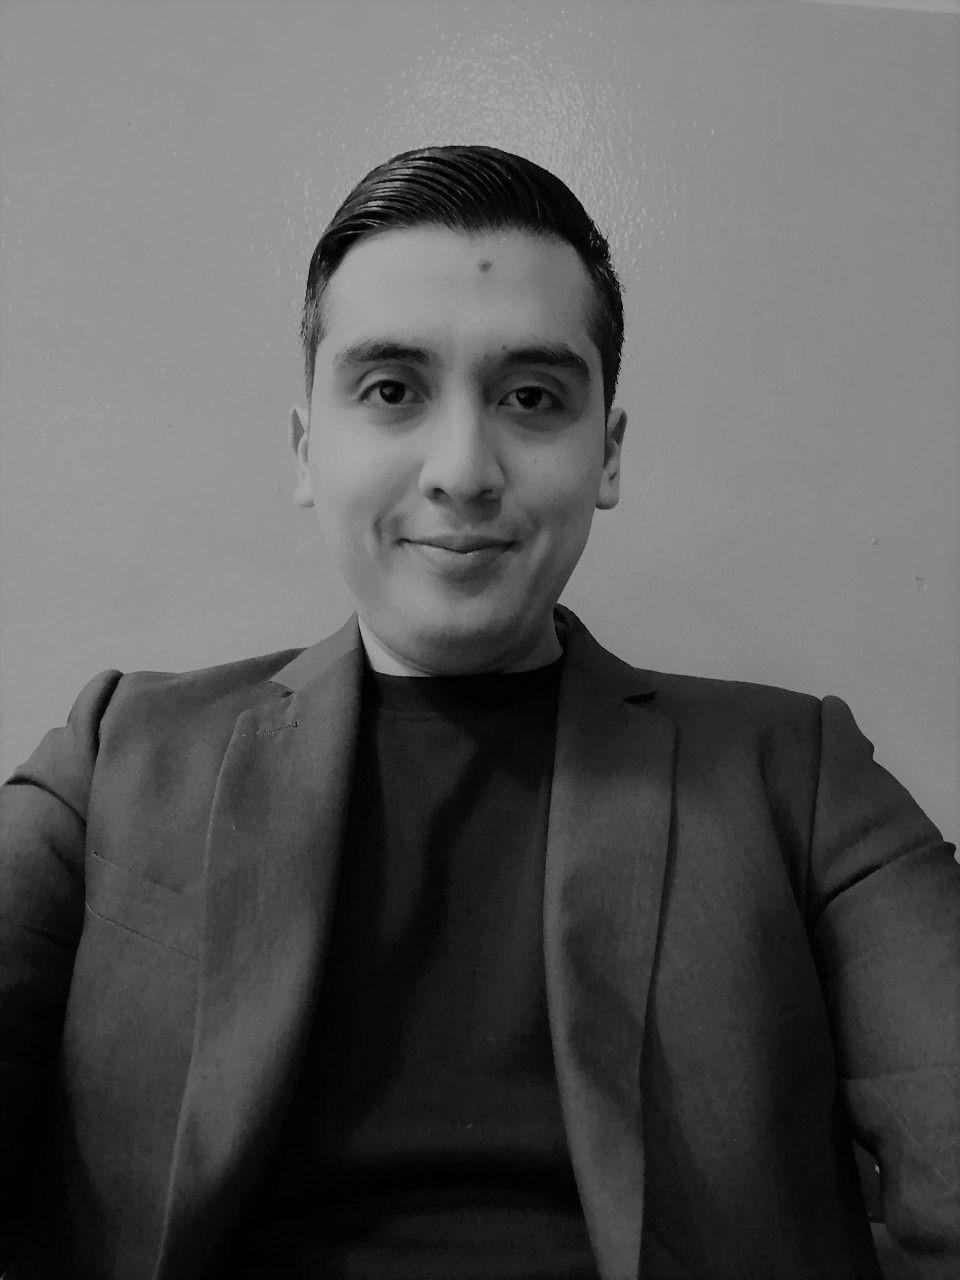 Diego Alejandro Manzano Pineda